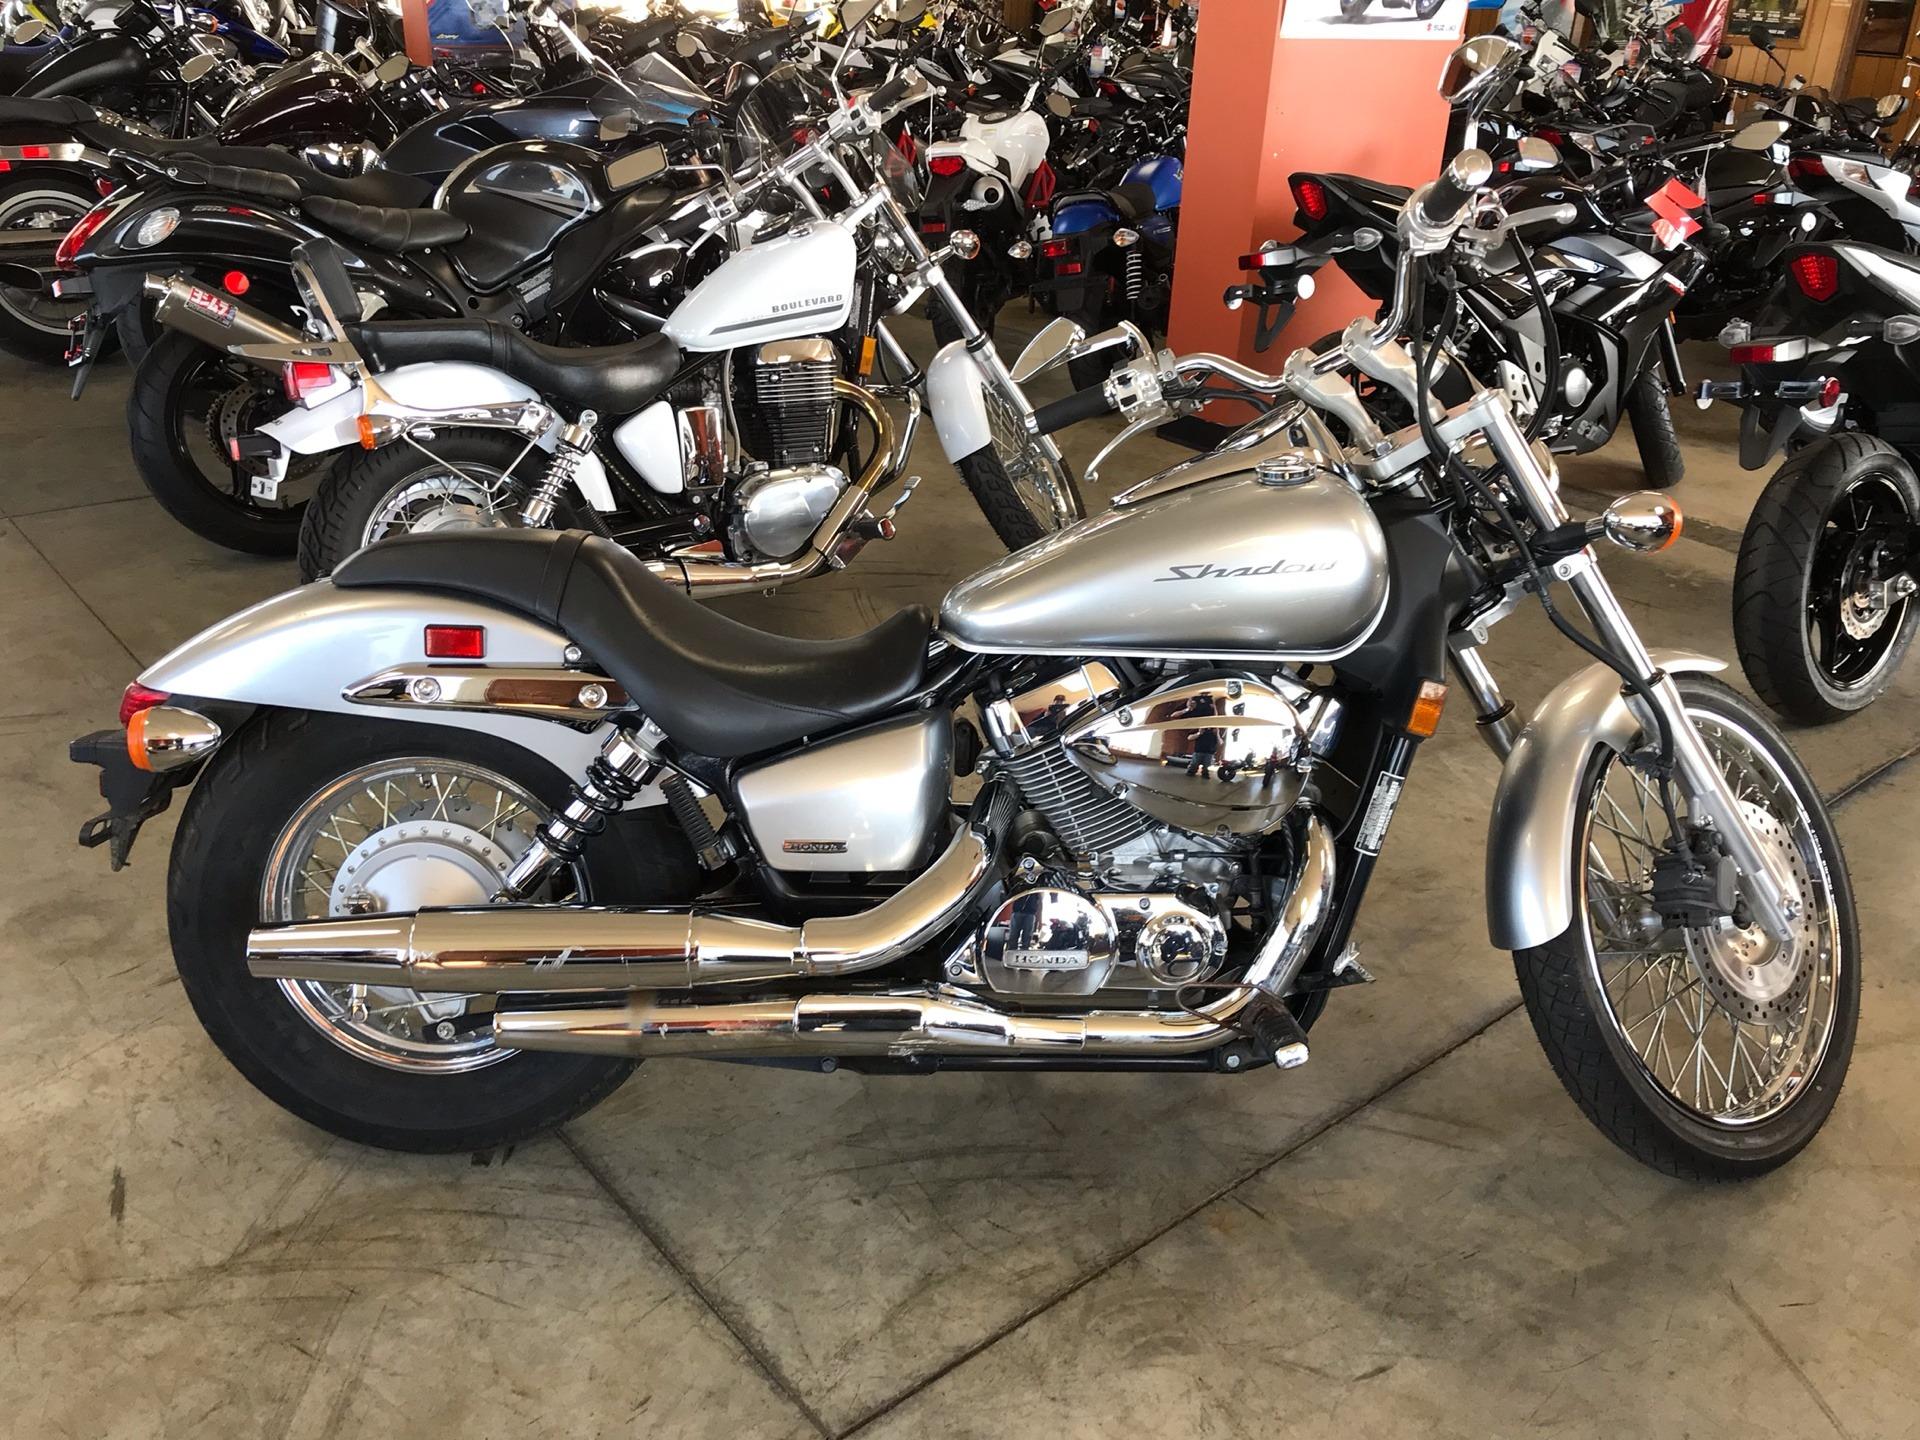 Used 2008 Honda Shadow Spirit 750 Metallic Silver Motorcycles In